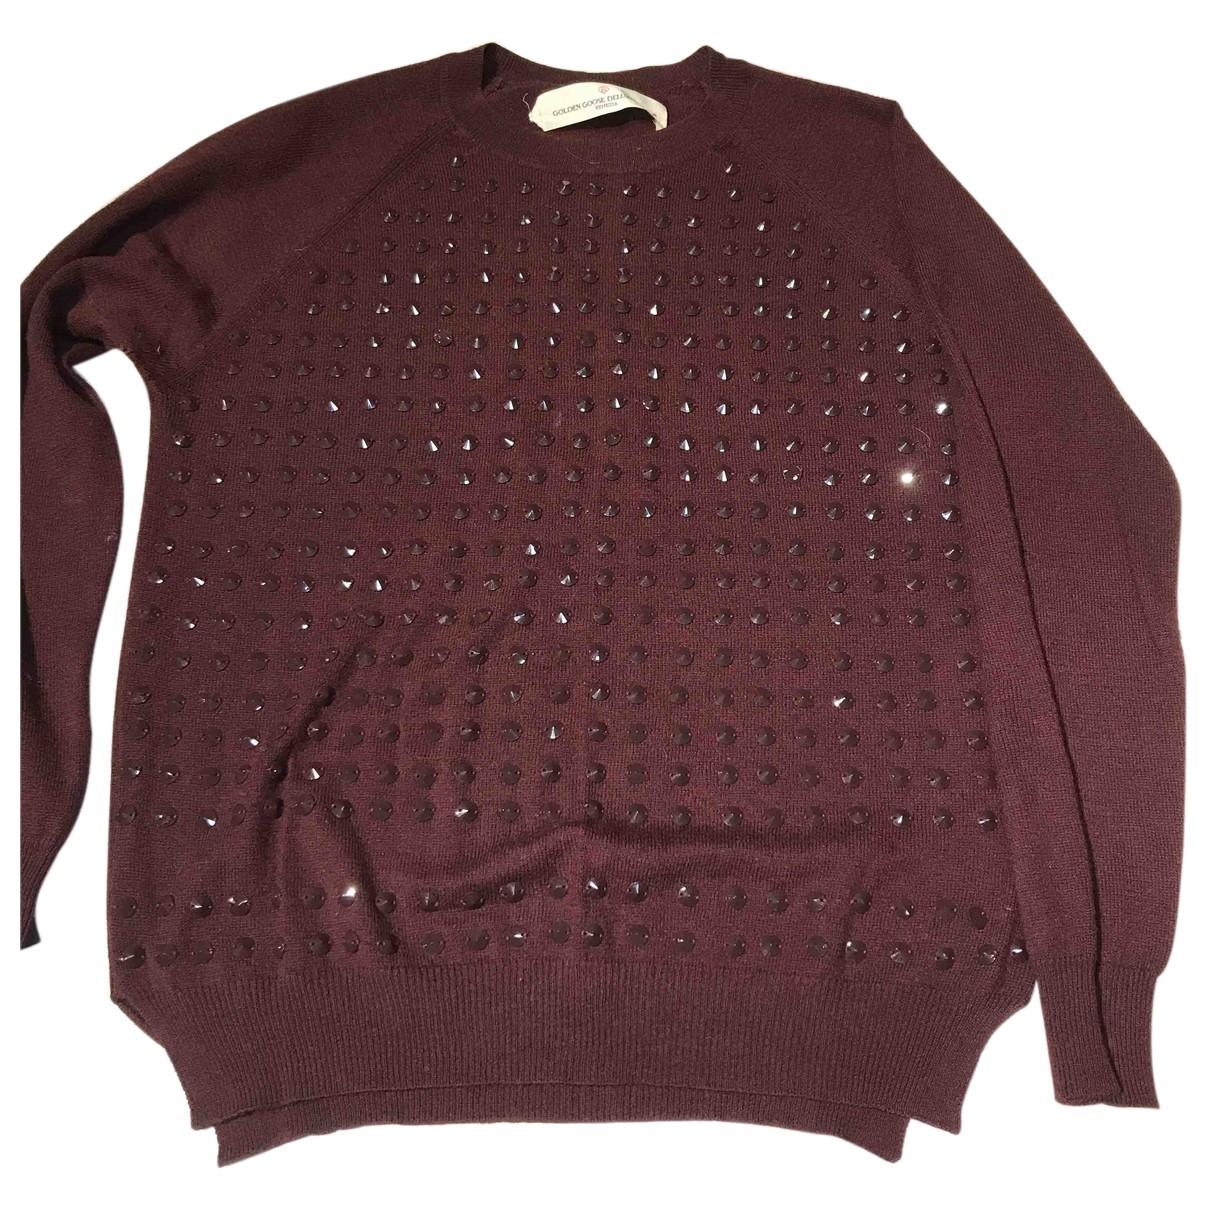 Golden Goose N Burgundy Wool Knitwear for Women M International